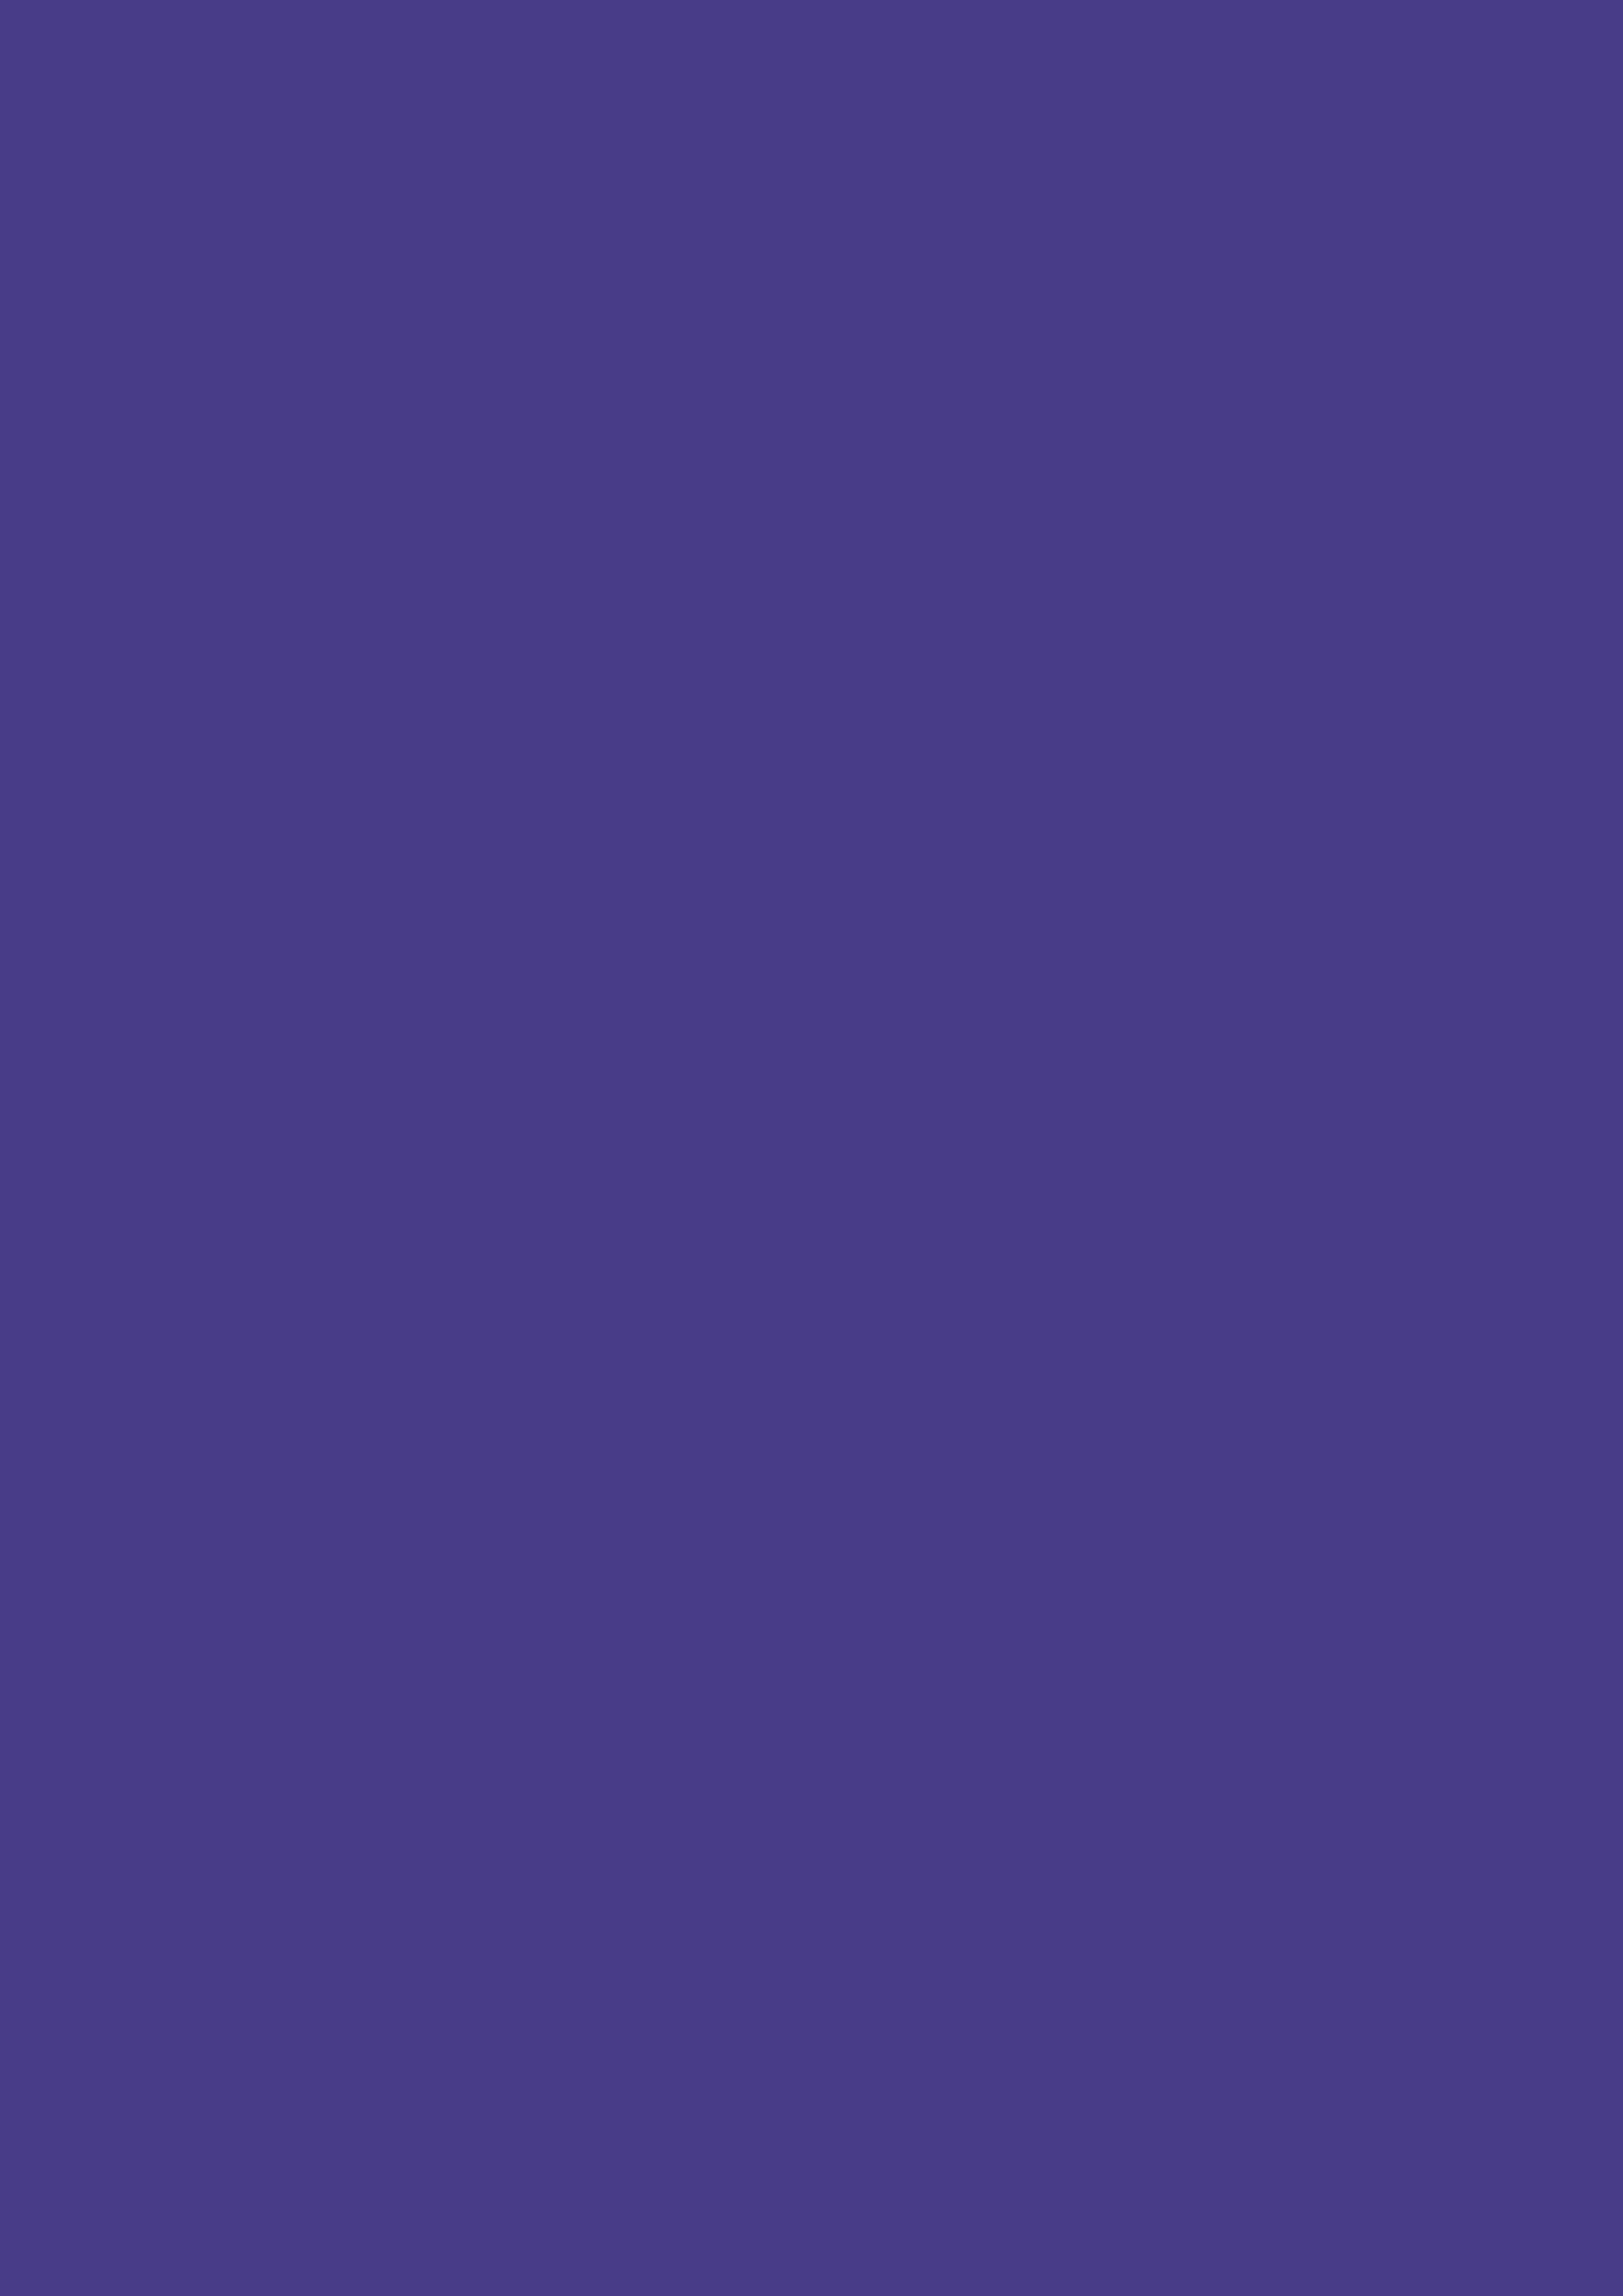 2480x3508 Dark Slate Blue Solid Color Background